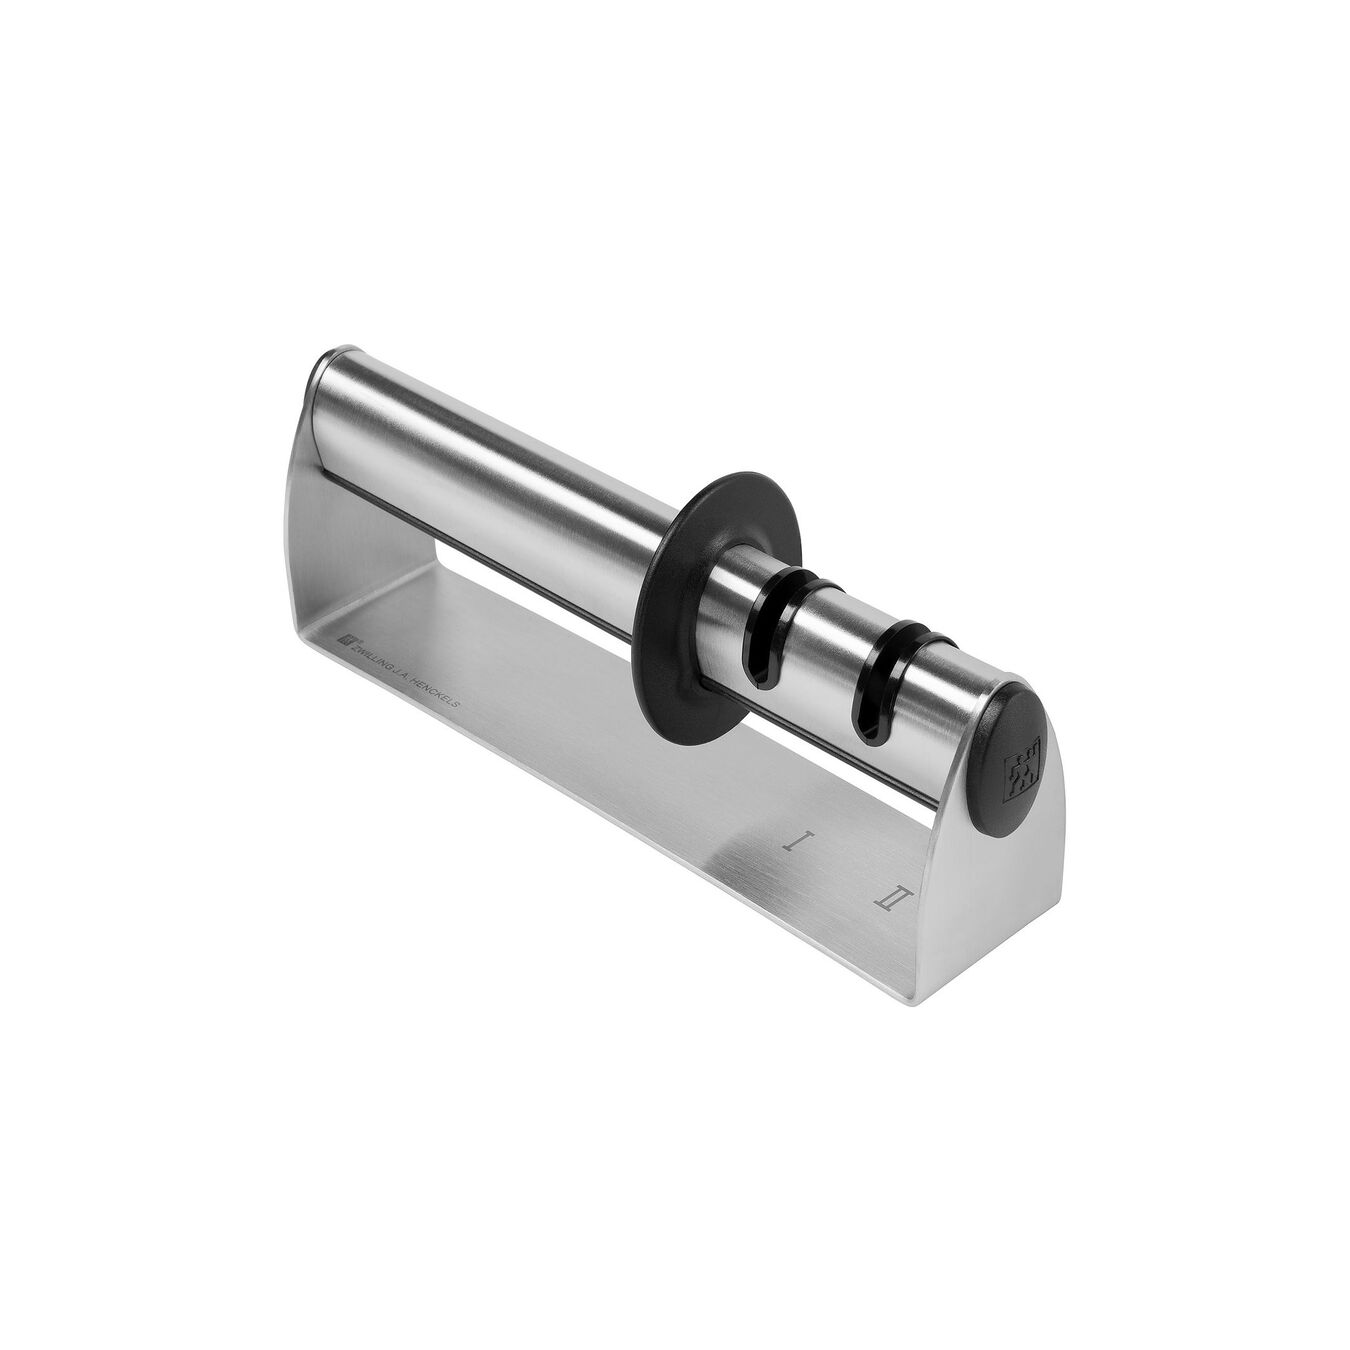 TWINSHARP Duo Stainless Steel Handheld Knife Sharpener,,large 4